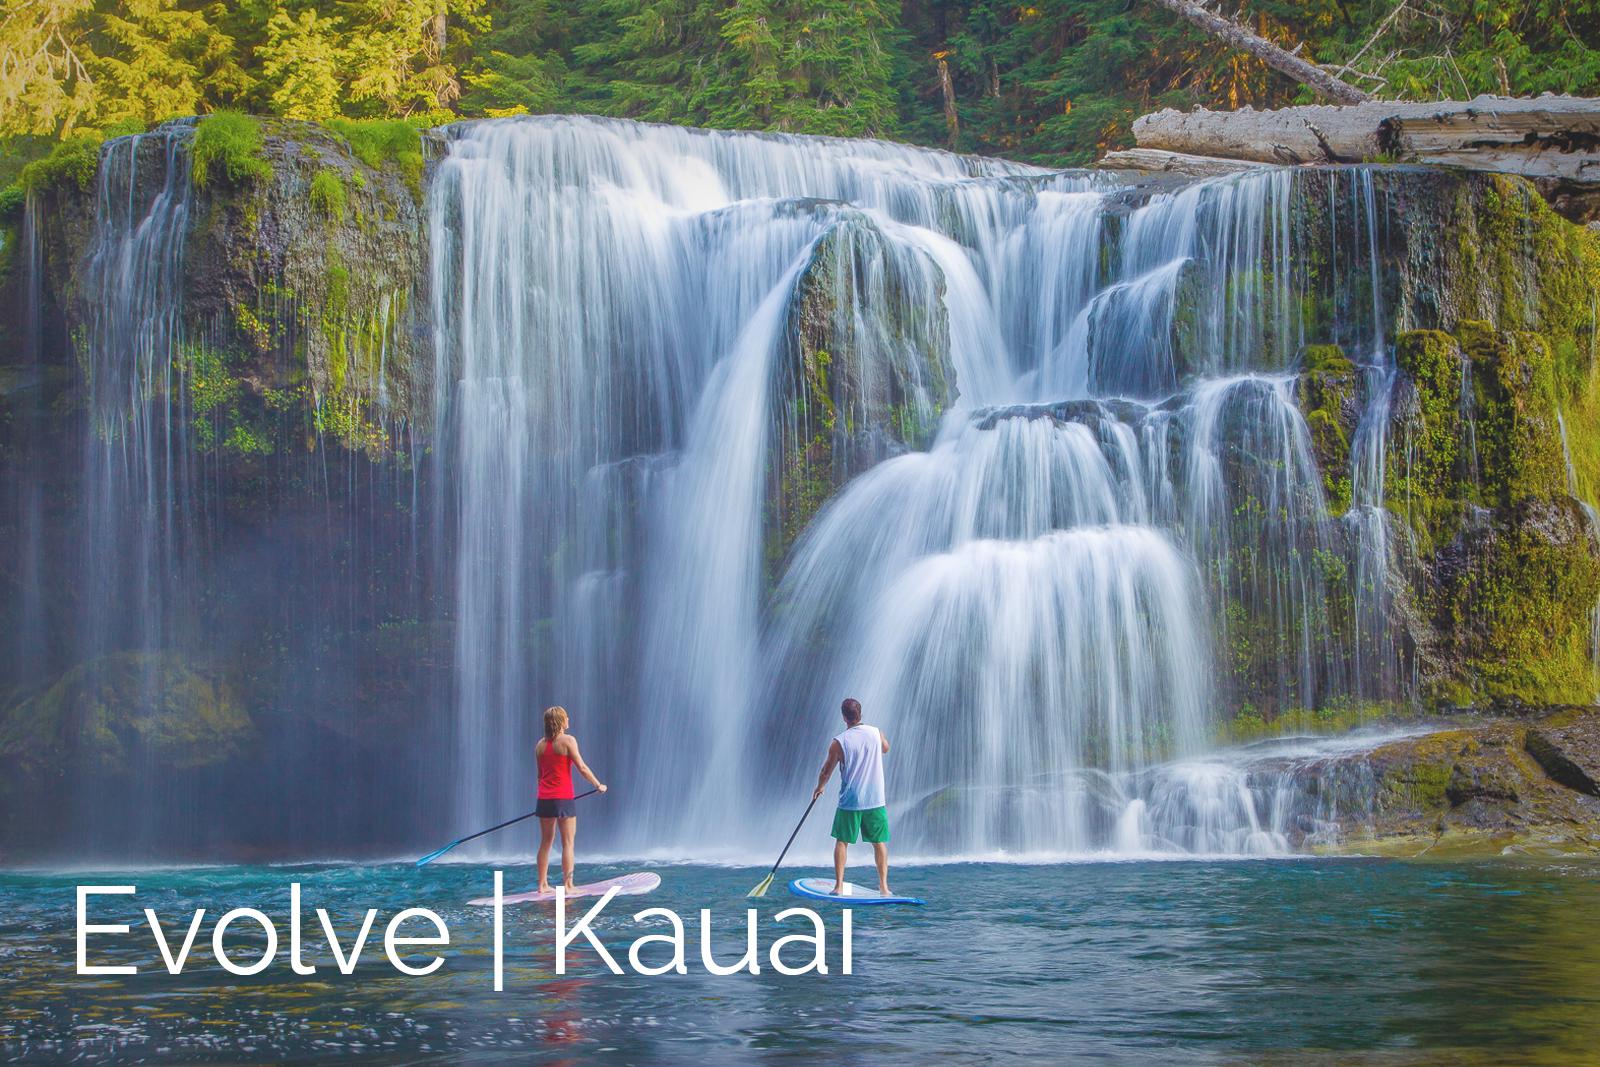 Evolve | Kauai